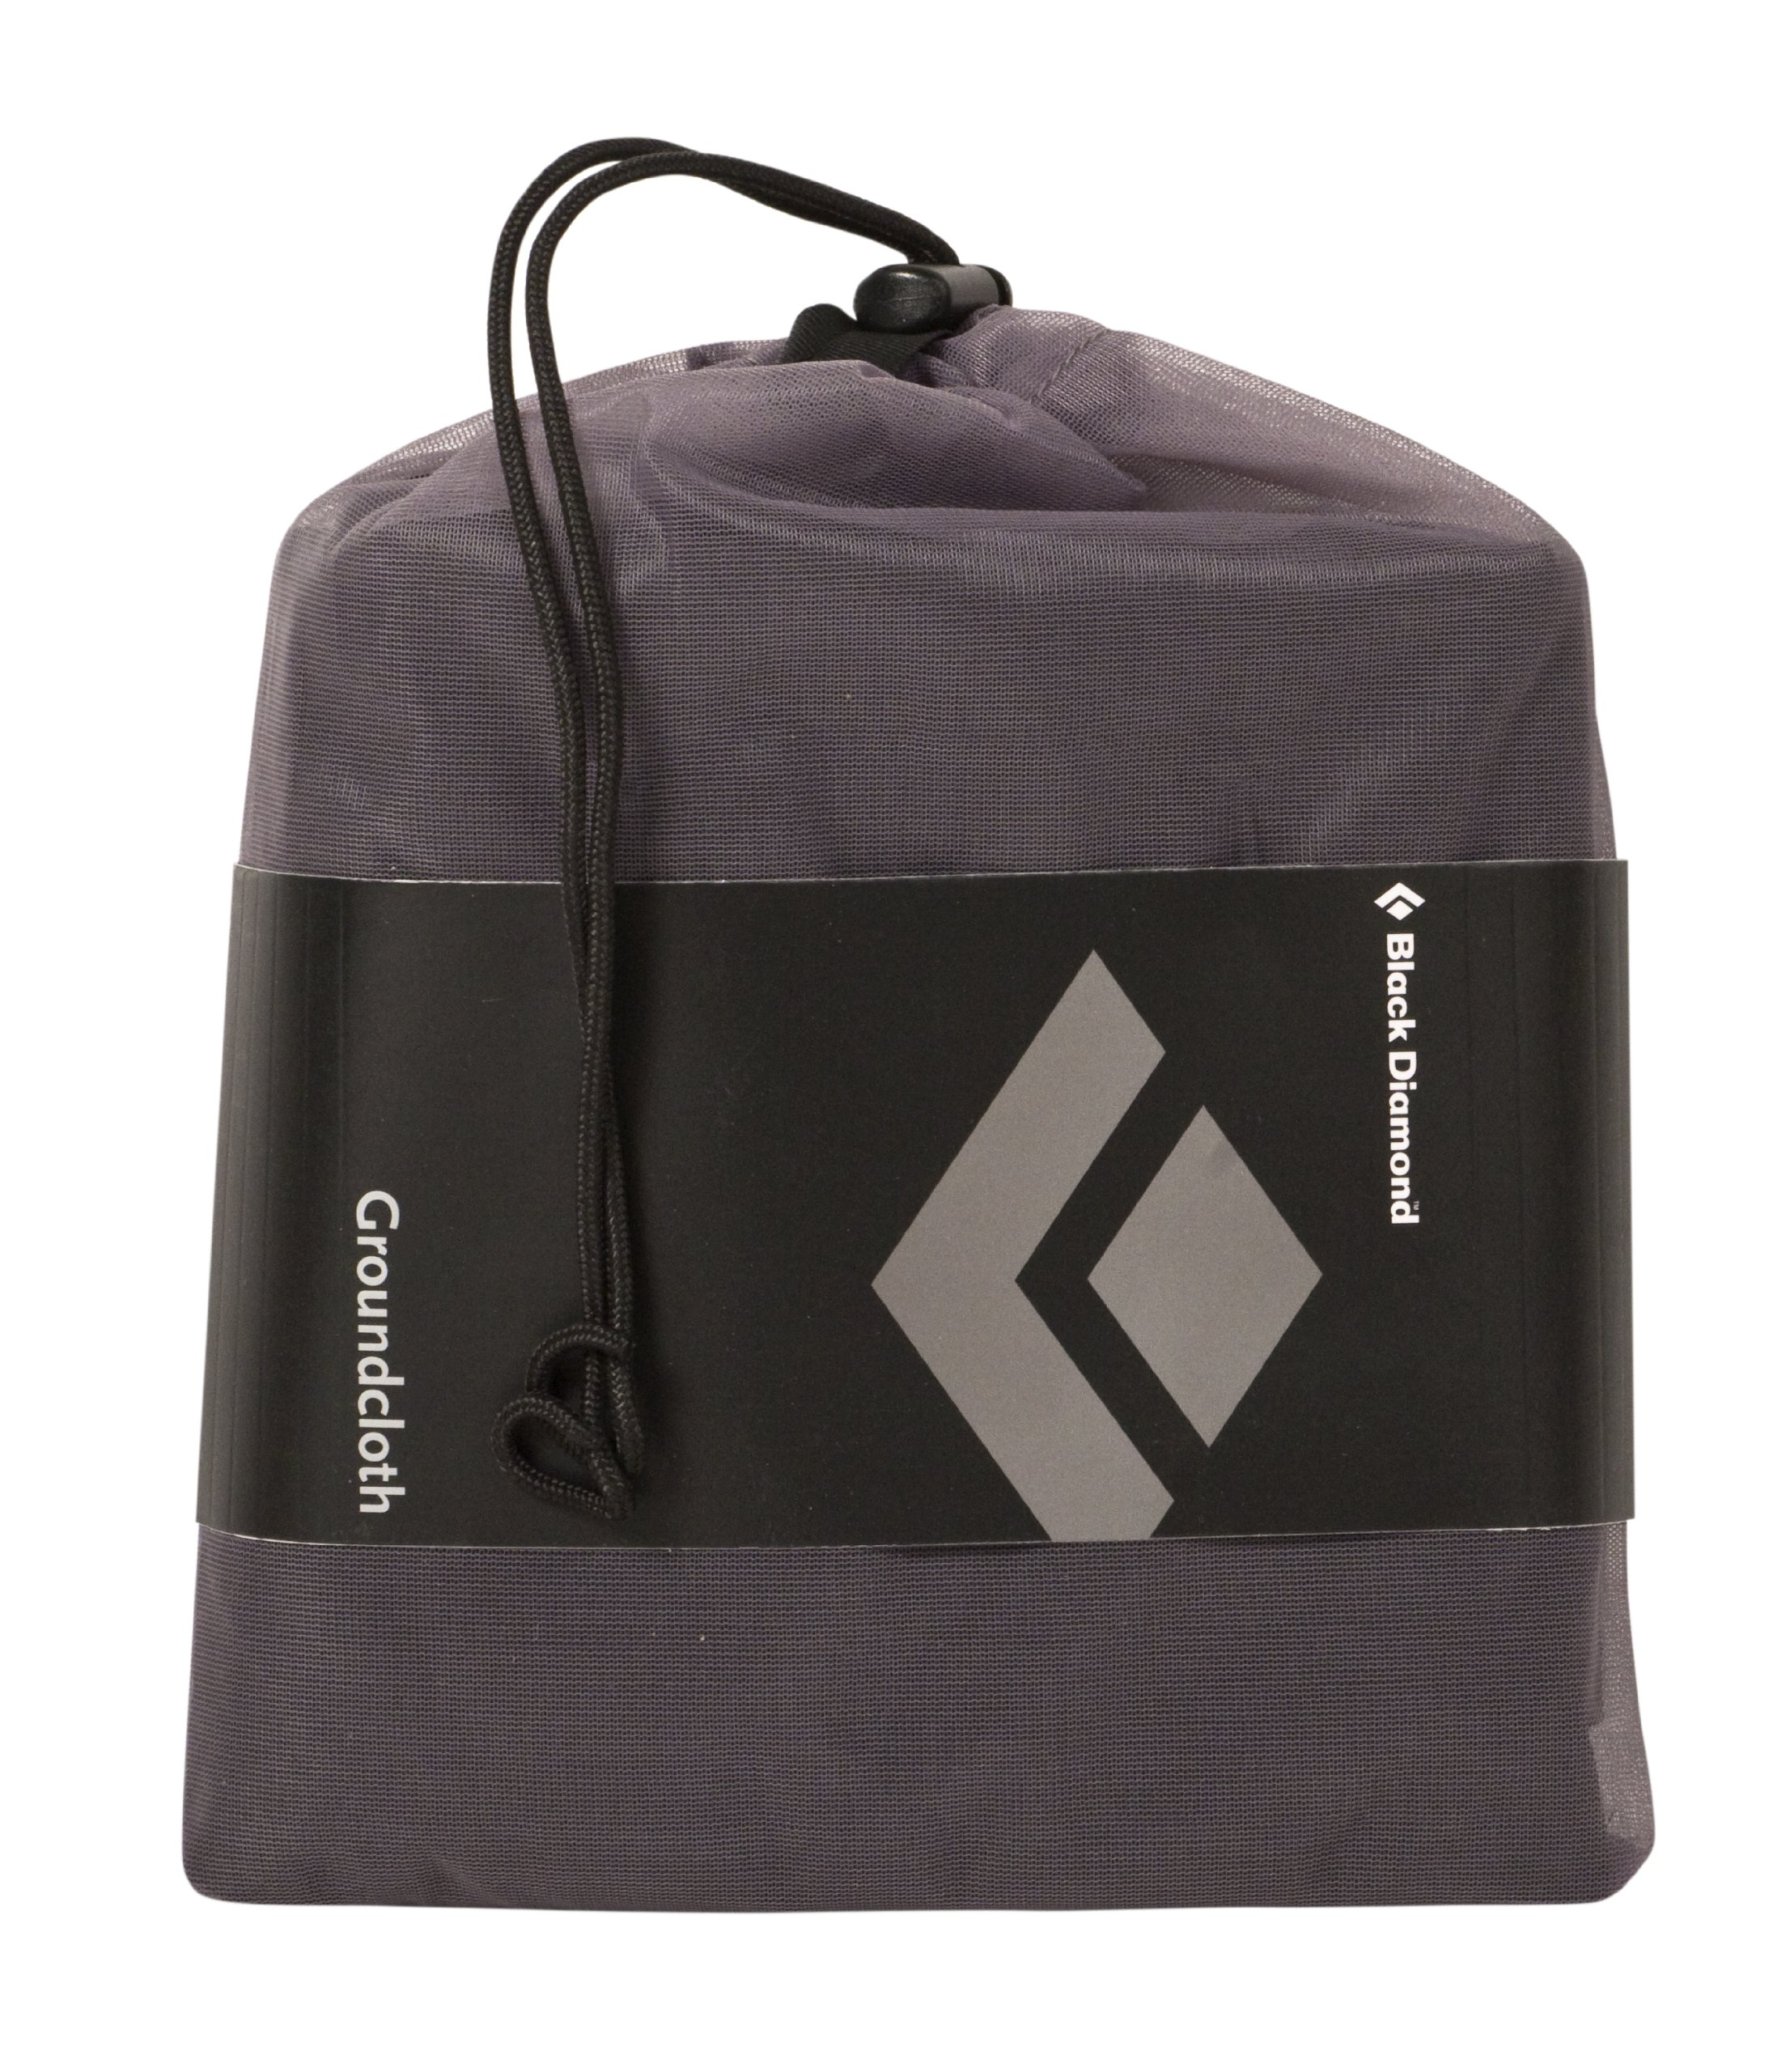 Black Diamond I-Tent/Firstlight Ground Cloth Tent by Black Diamond